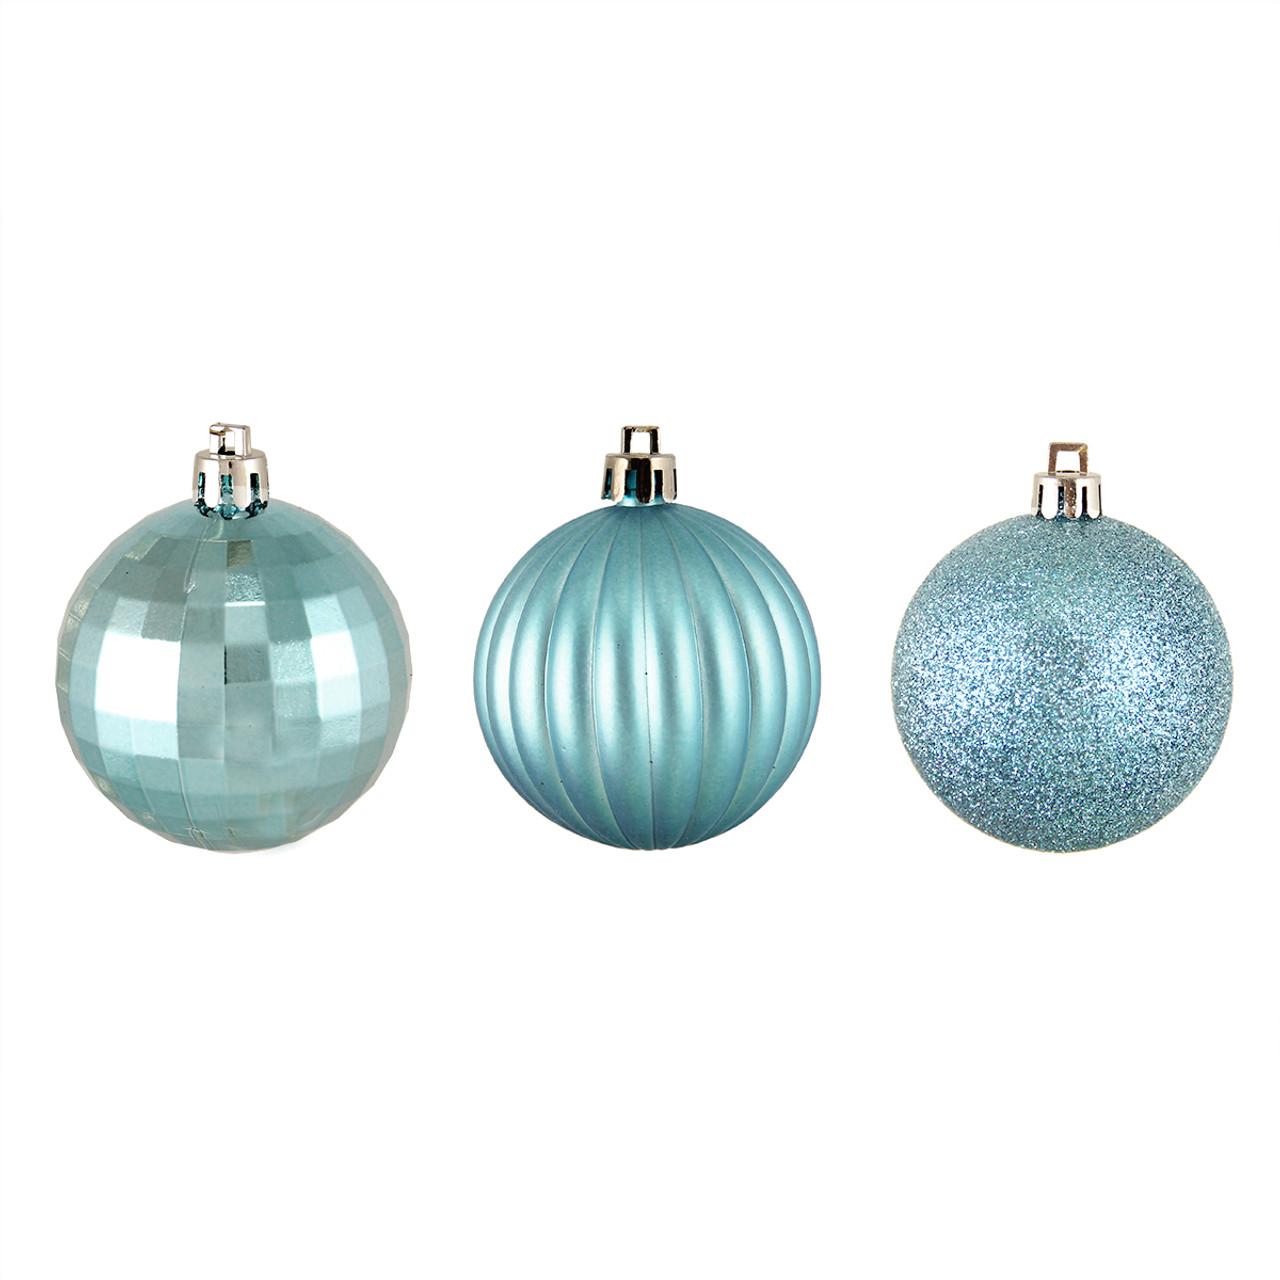 northlight - Light Blue Christmas Ornaments